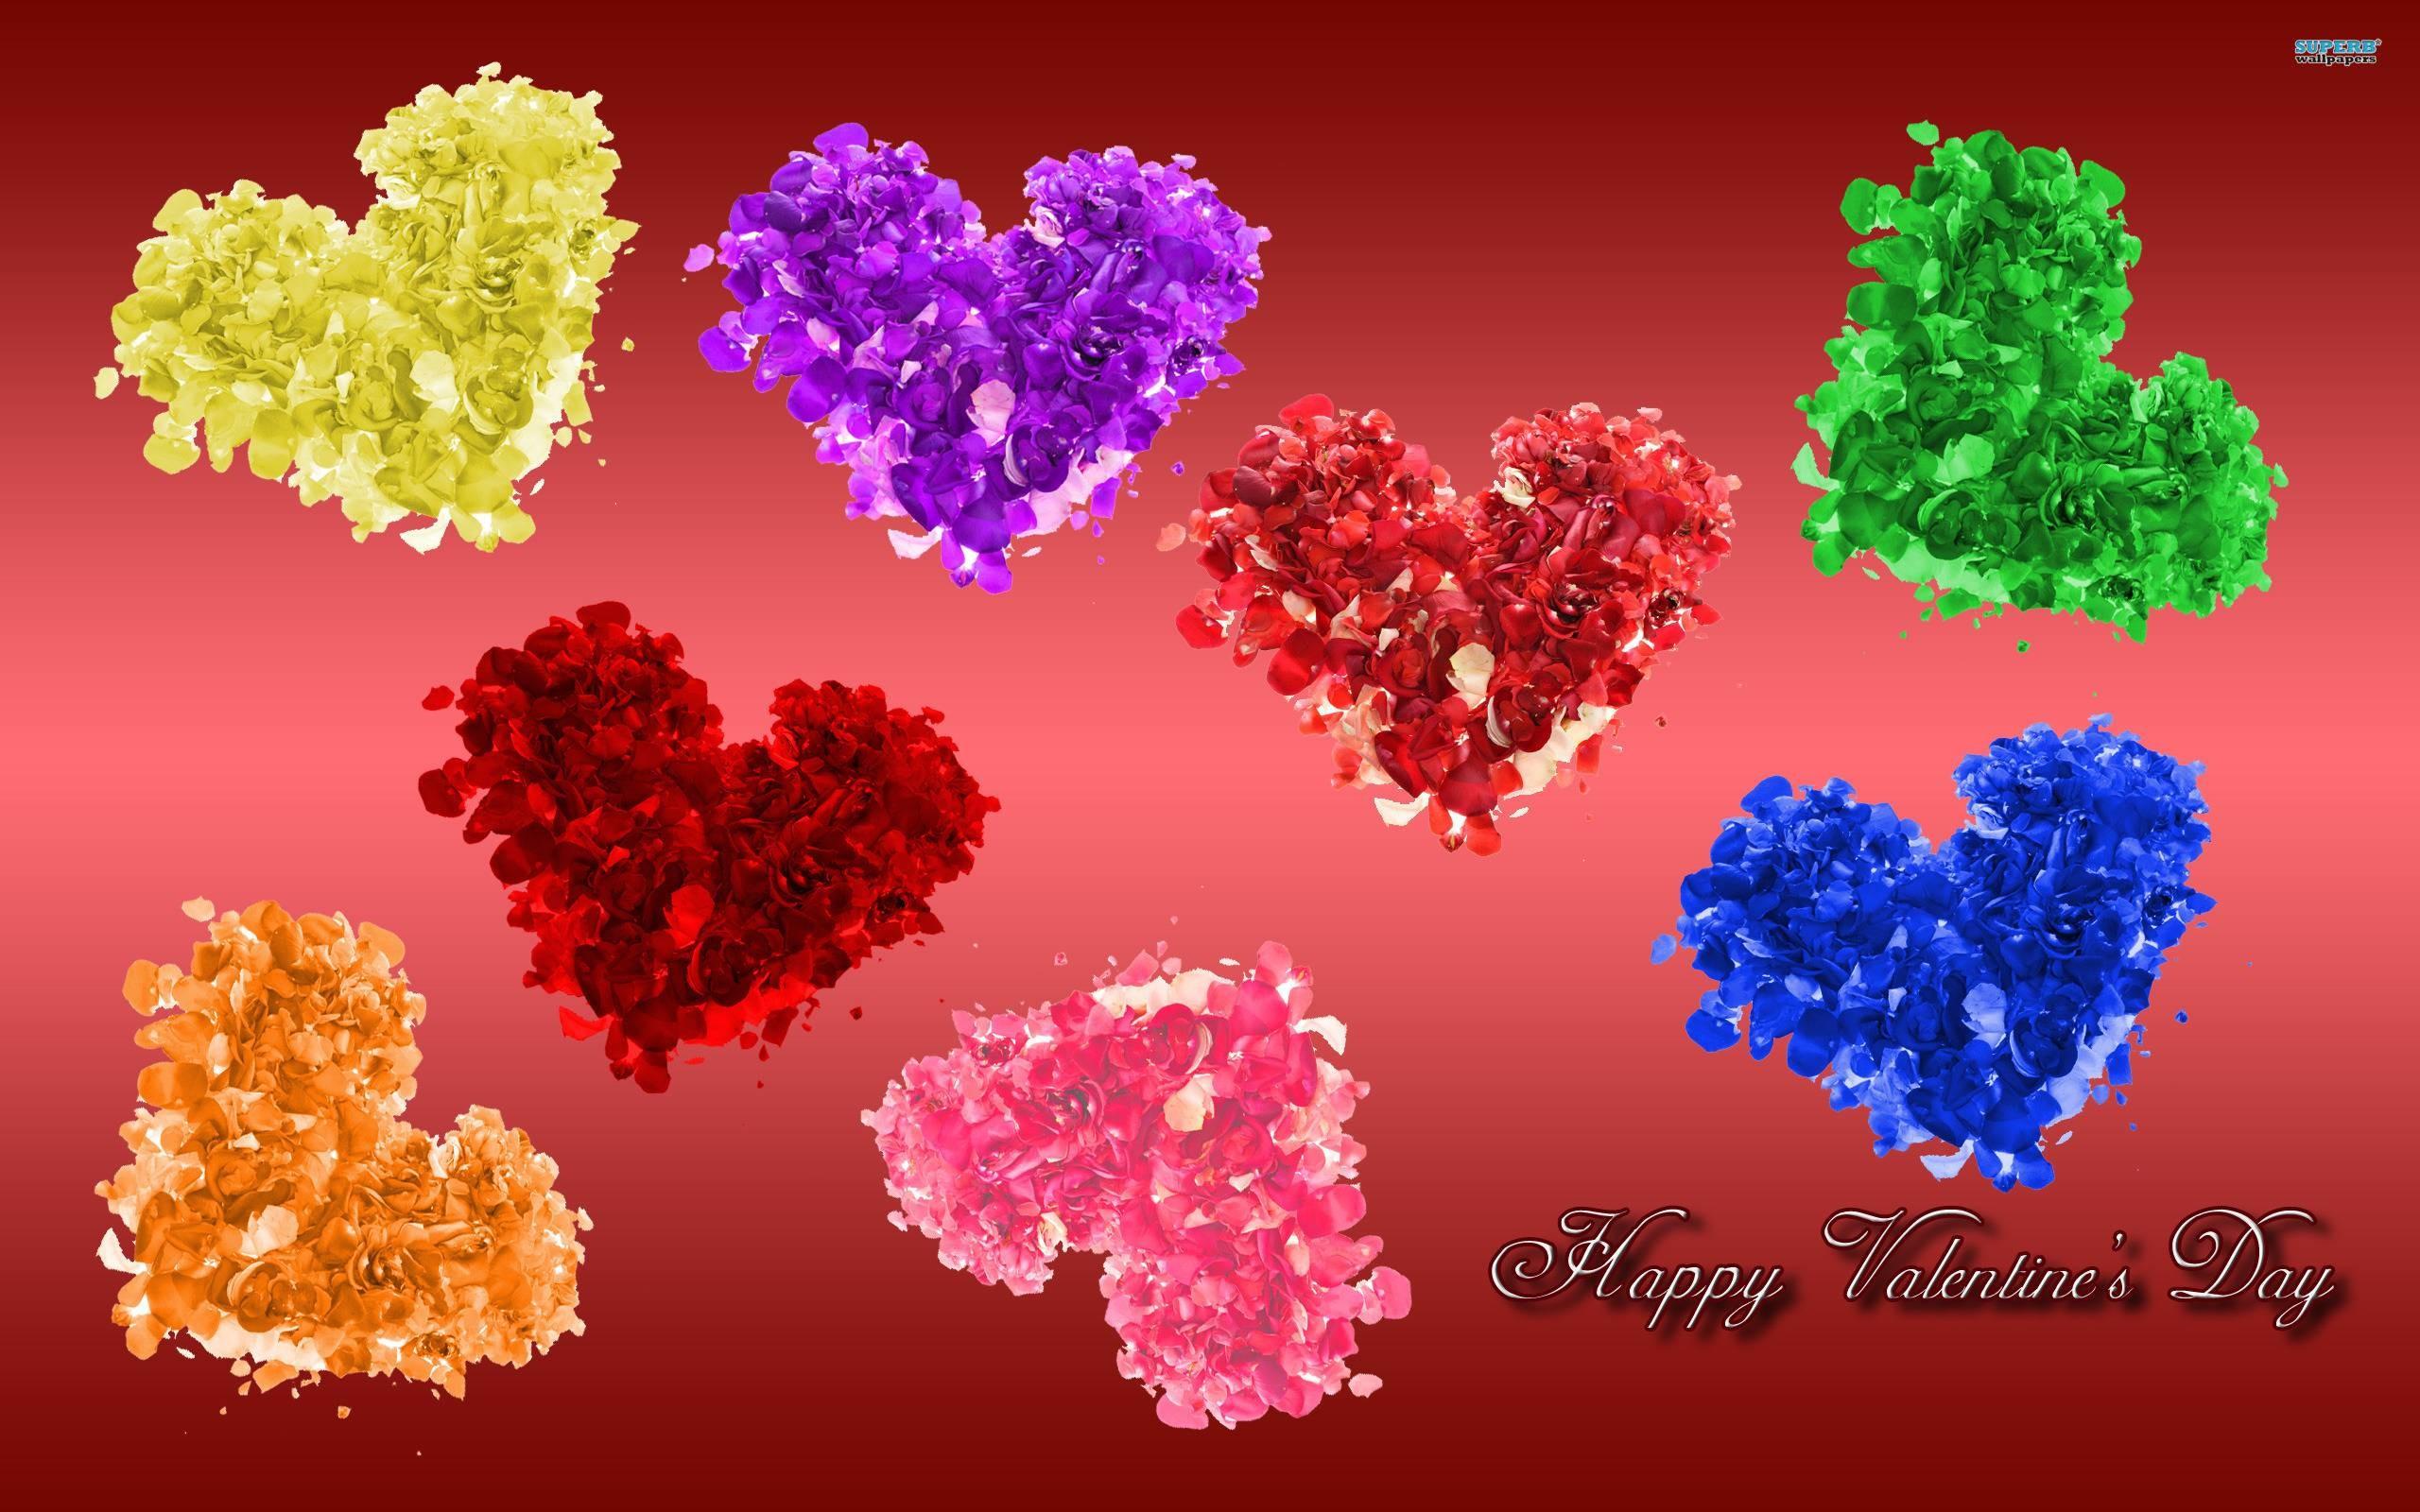 Wallpapers For Happy Valentines Day Wallpaper Desktop   Cute Happy 2560x1600